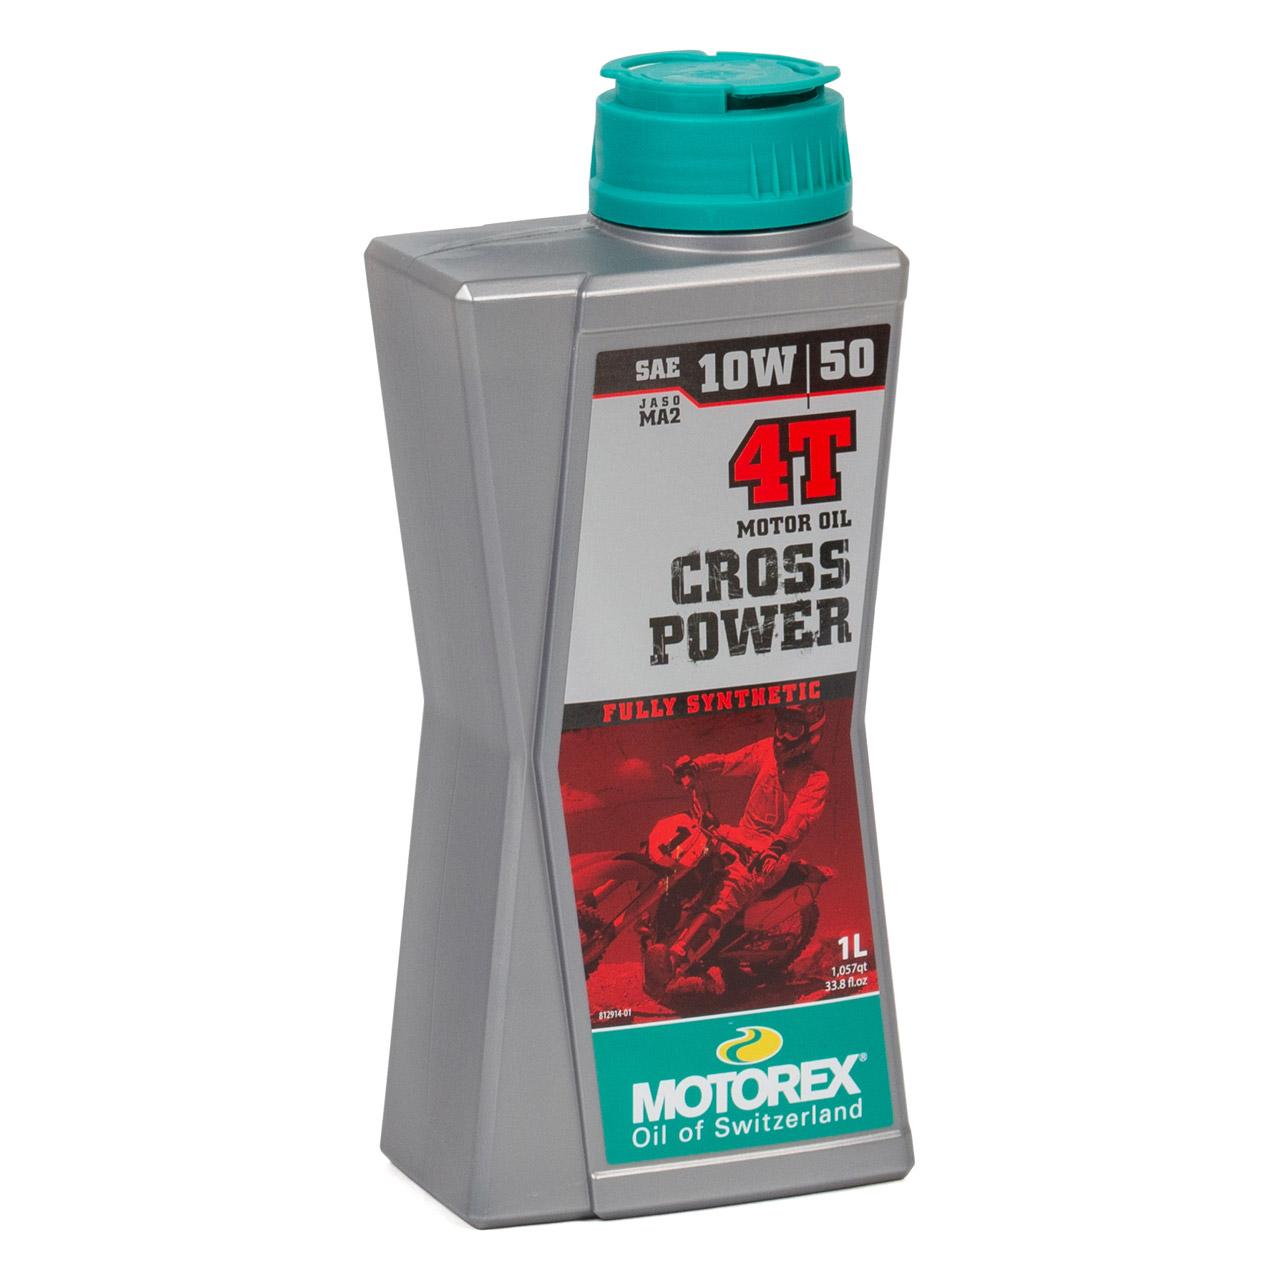 MOTOREX Cross Power 4T Motoröl Öl 10W50 JASO MA2 API SN/SM/SL - 1L 1 Liter